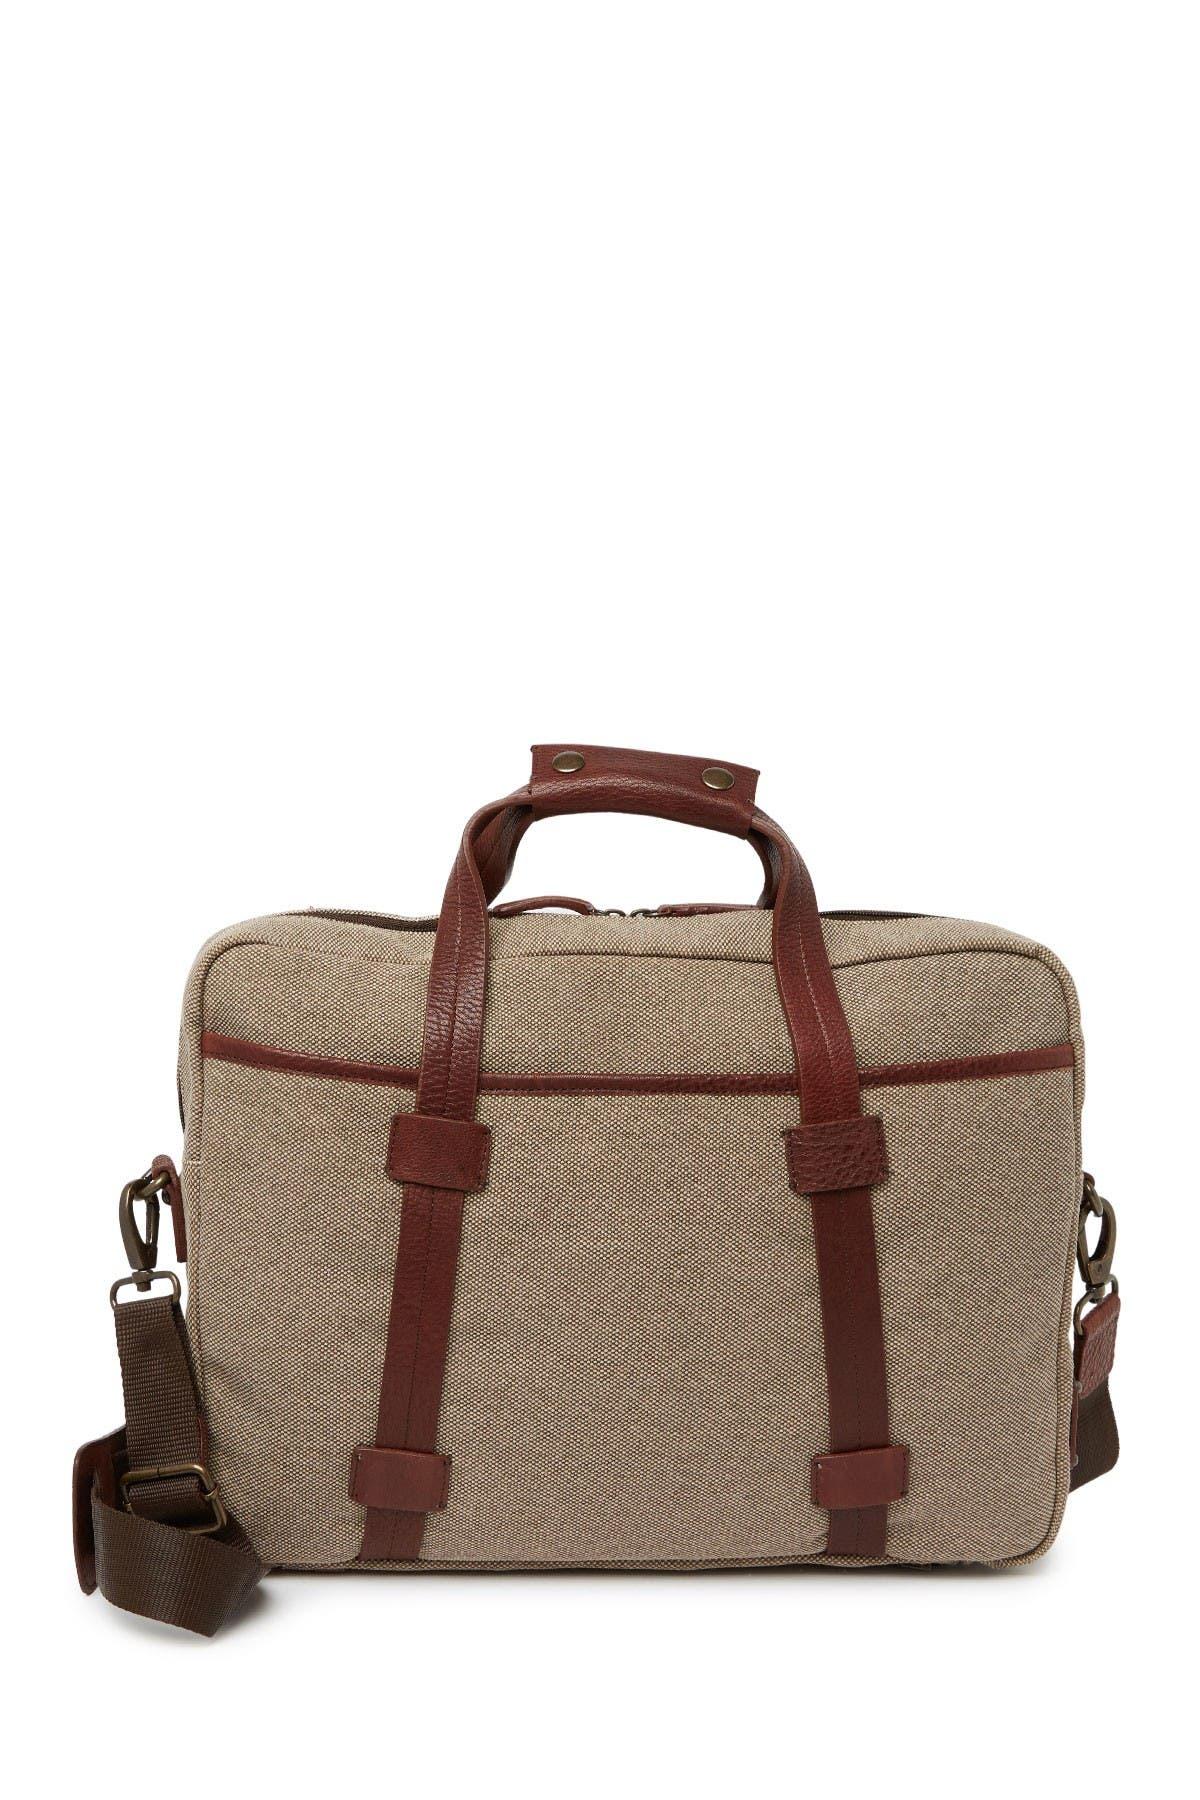 Image of BOSCA Fabric & Washed Ziptop Bag